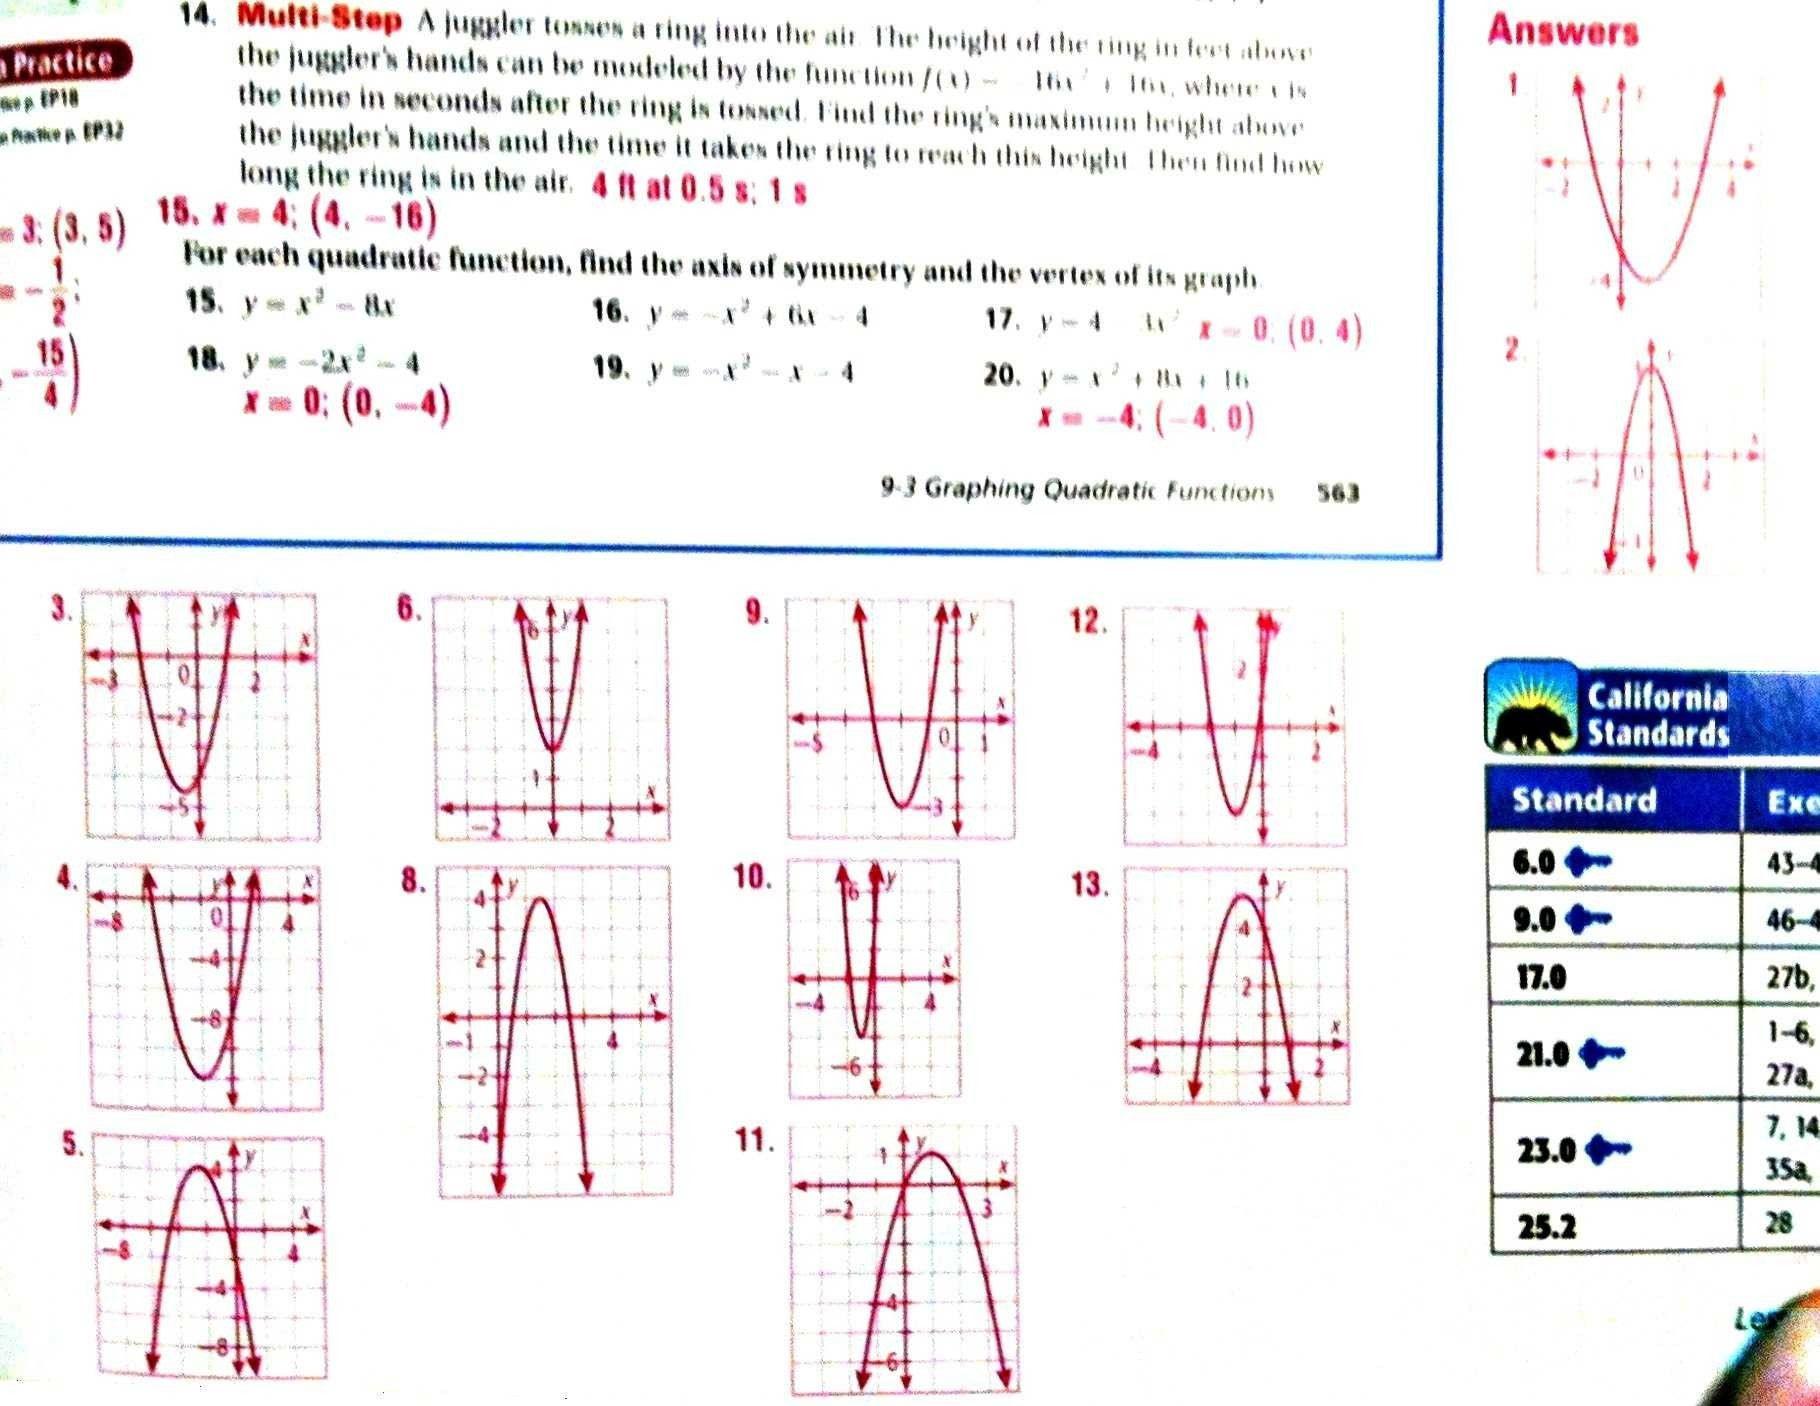 Graphing Quadratic Functions Worksheet Answers Algebra 2 ...